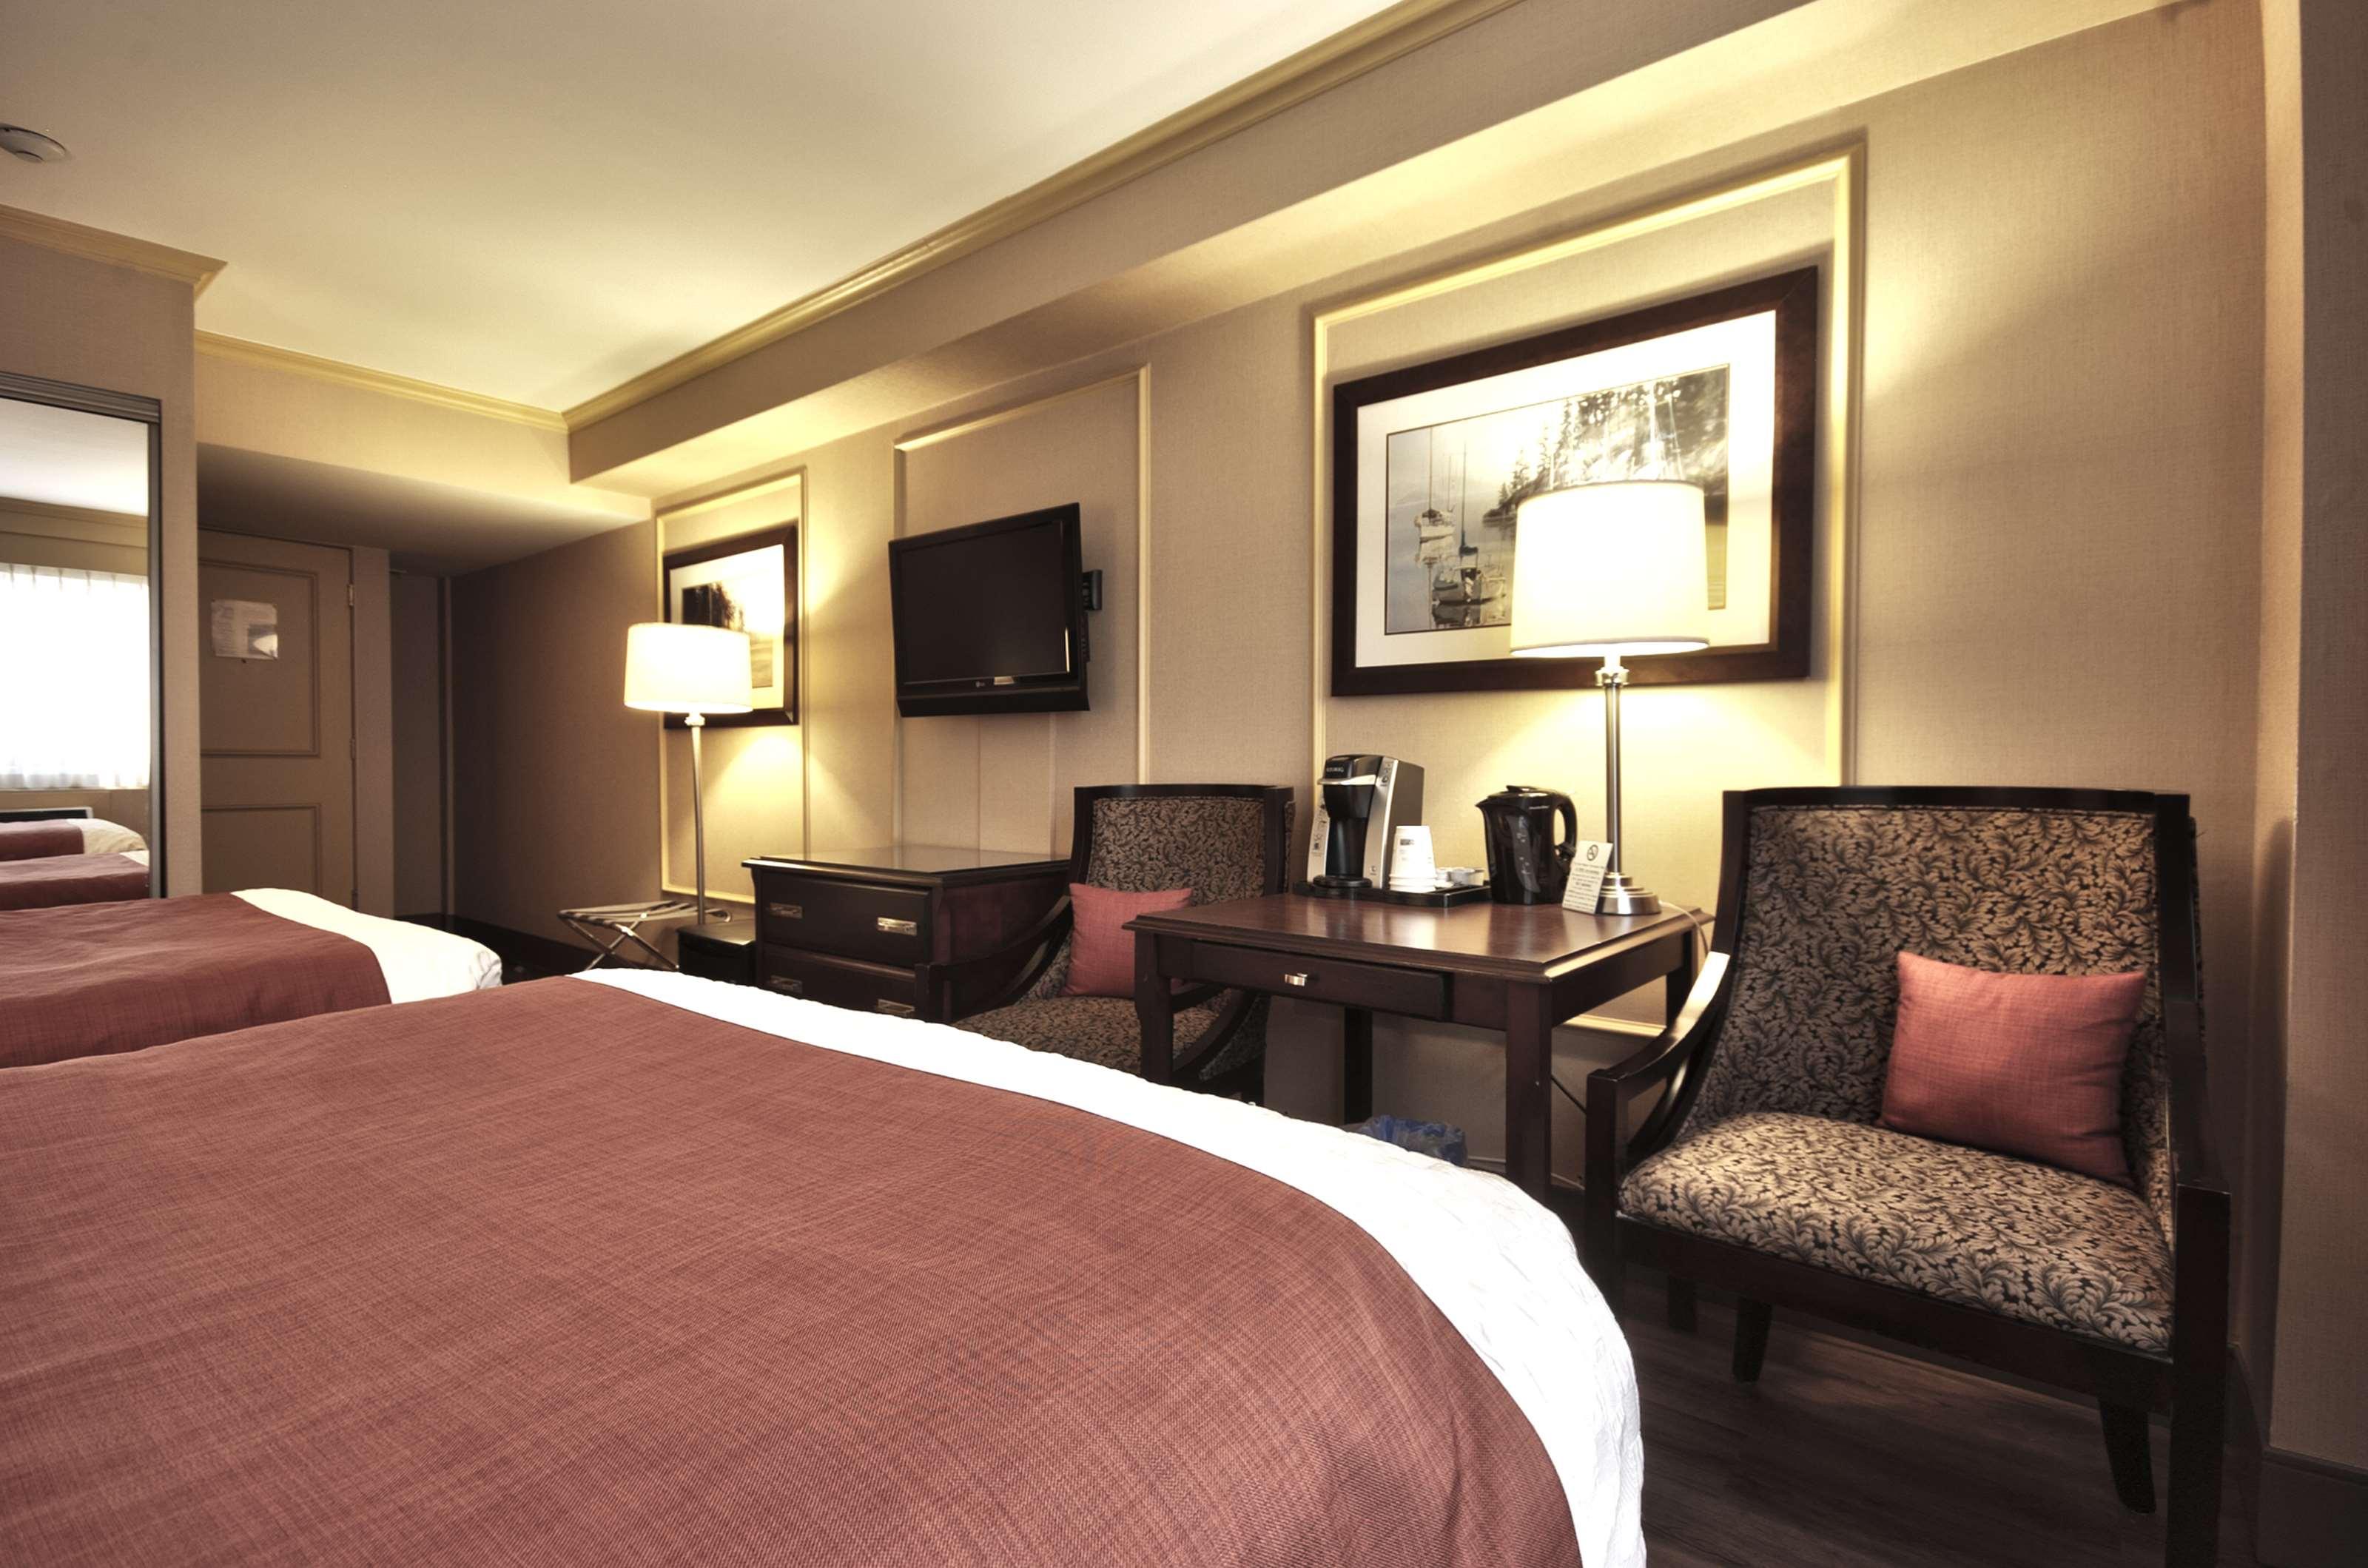 Best Western Hotel Dorchester Ma